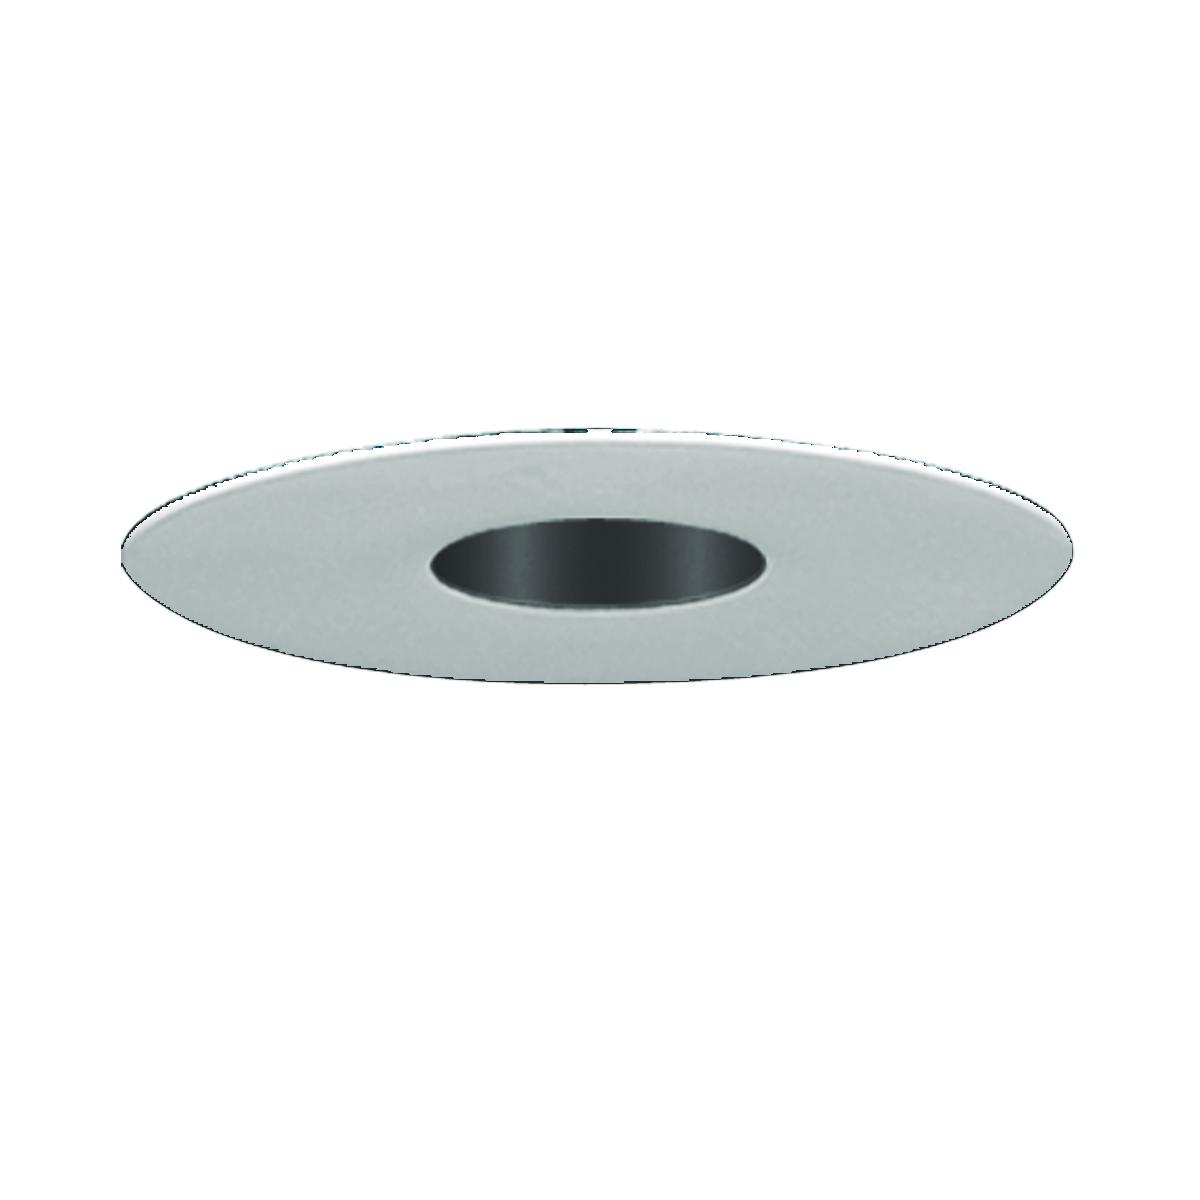 "1 3 - 4"" Xicato LED Directional Pinhole"